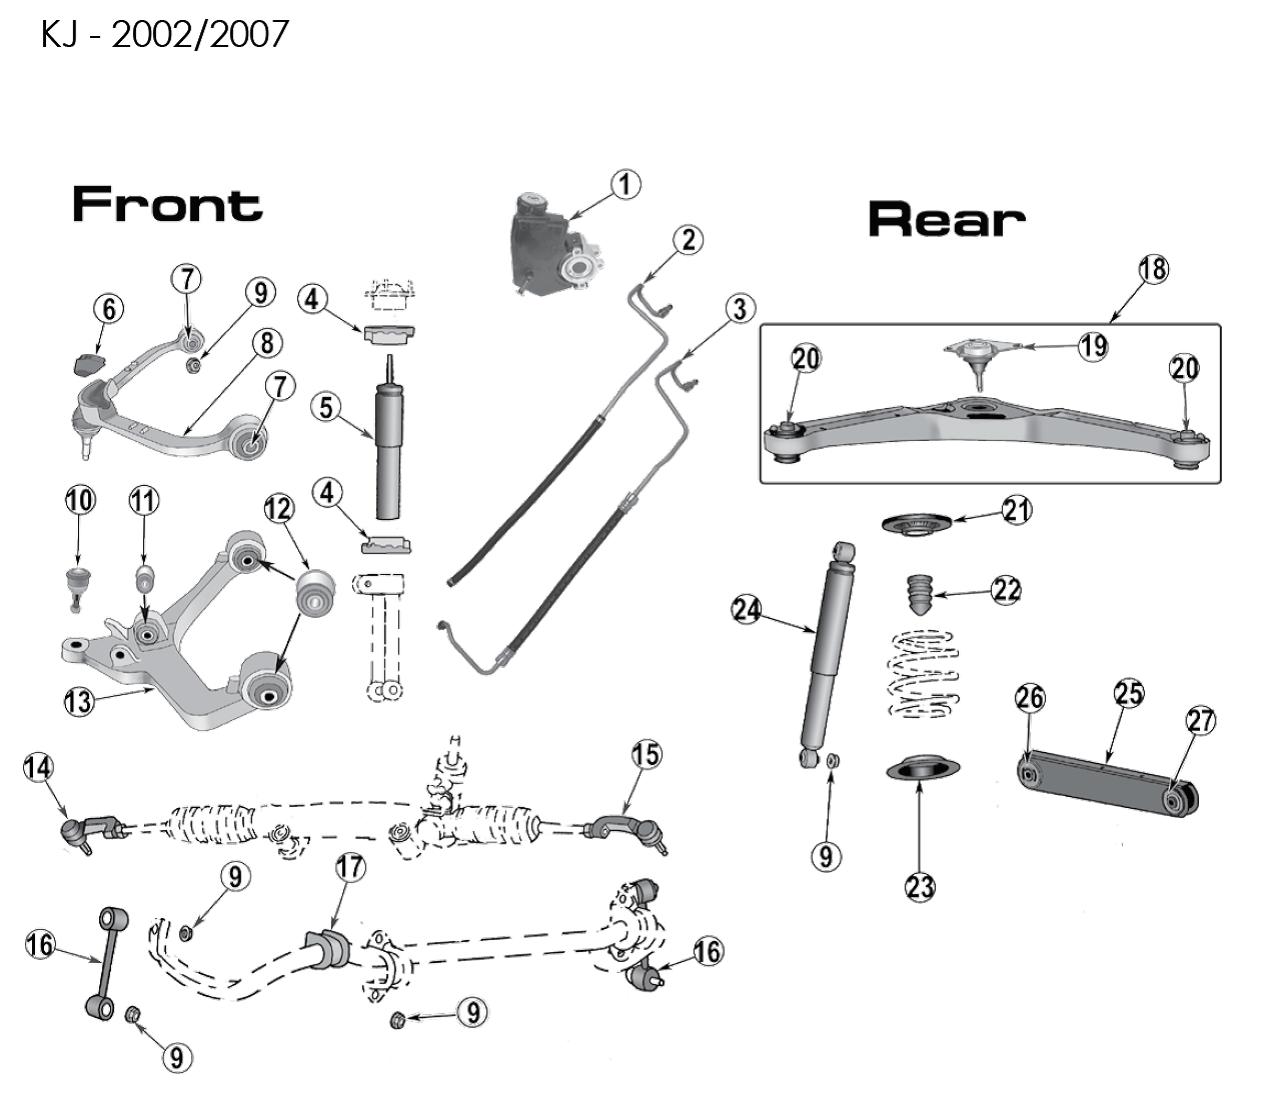 Front Upper Control Arm Bushing Kj Ab